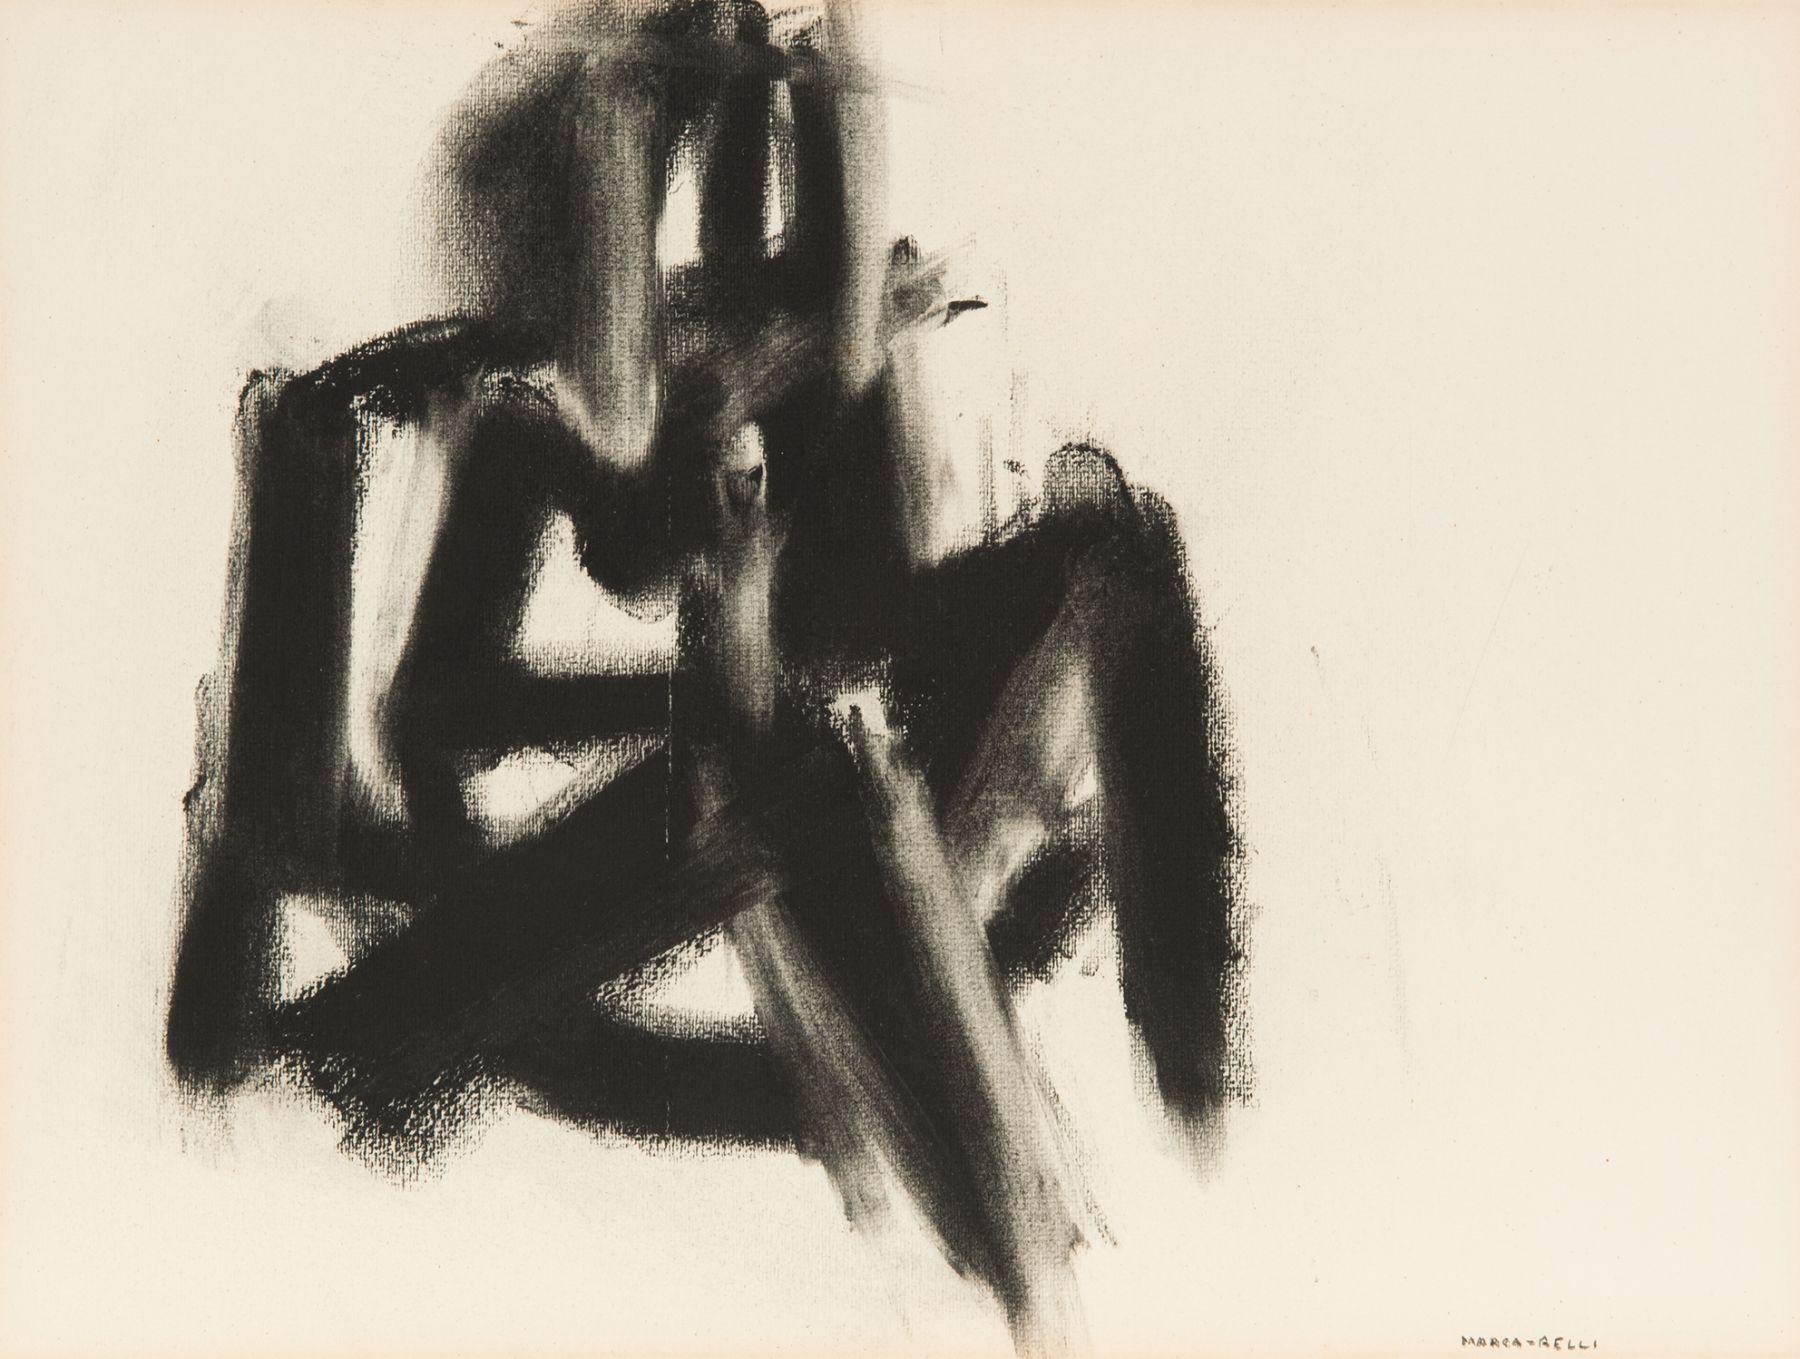 Conrad Marca-Relli (1913-2000) D-10-66, 1966